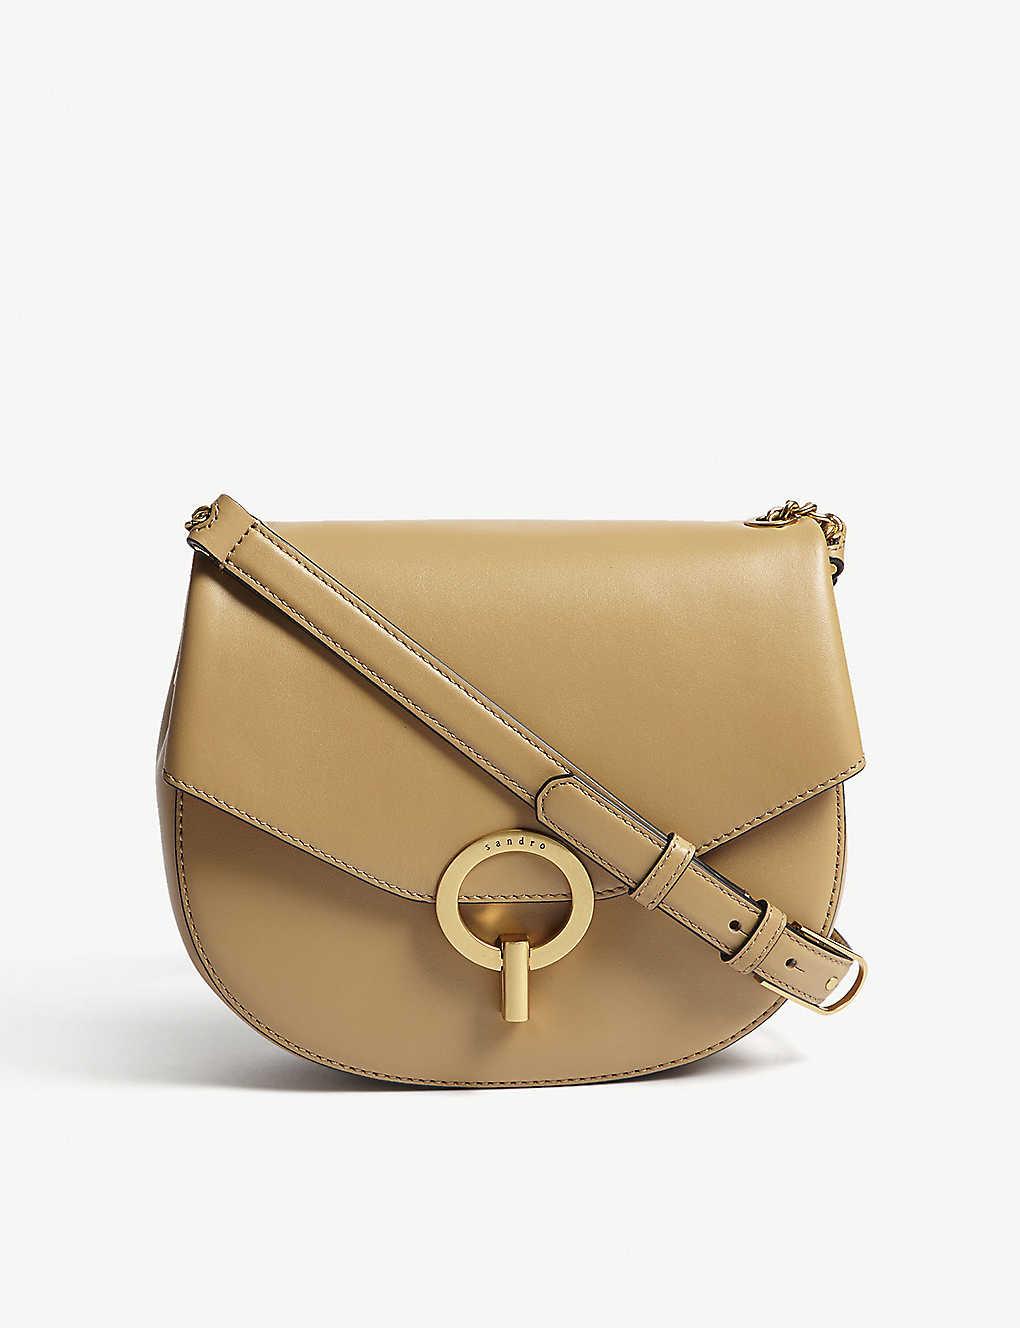 79b1a657fadc SANDRO - Pepita leather cross-body bag